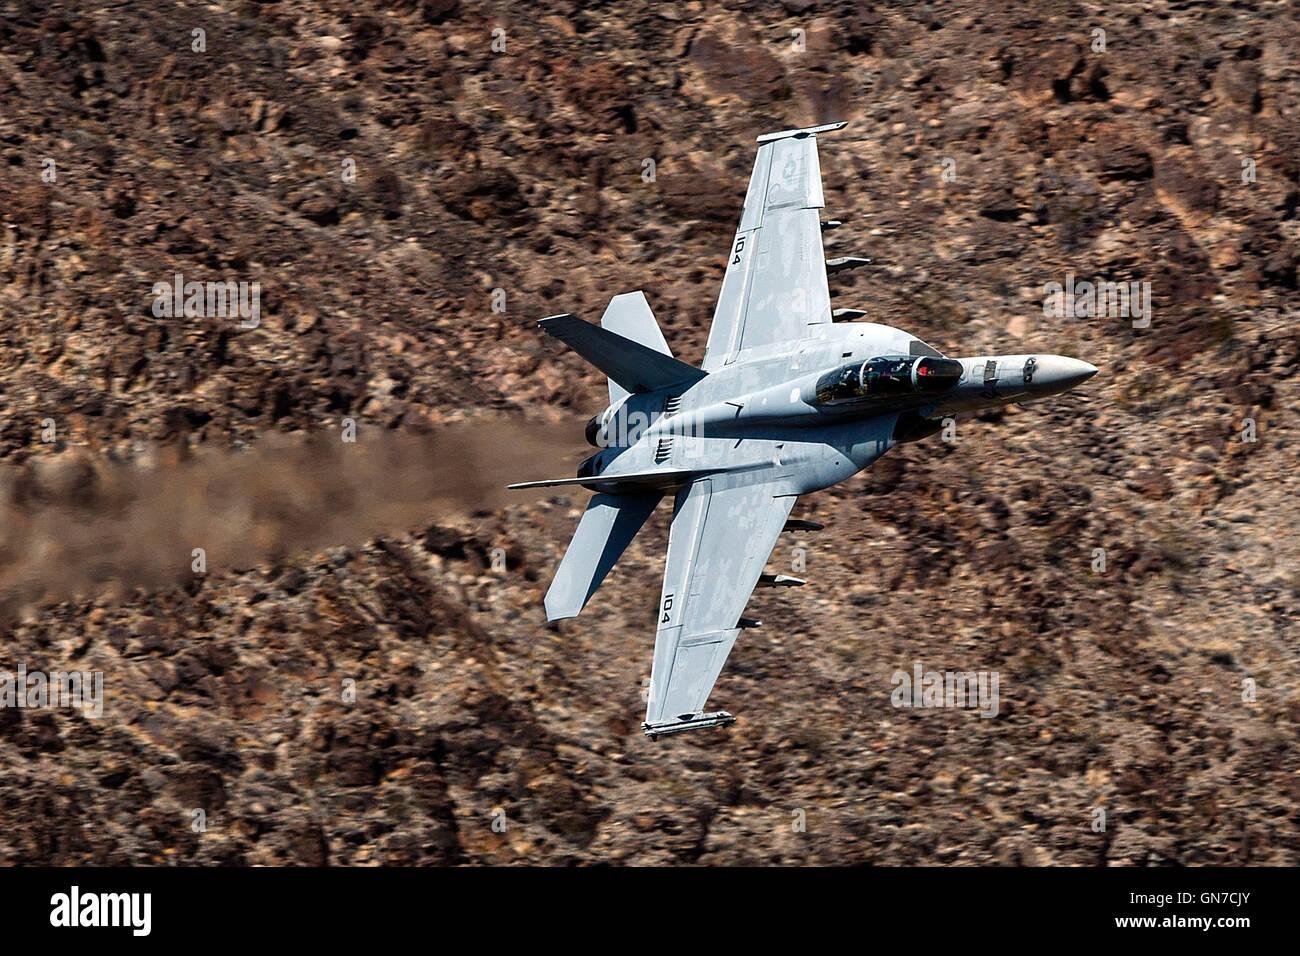 US Navy Boeing F/A-18F Super Hornet NH-104 (SN 166877) à partir de la VFA-154 l 'Black Knights' vole dans la Transition Jedi, R-2508, complexe Canyon Star Wars / Rainbow Canyon, Death Valley National Park, California, United States of America. Banque D'Images